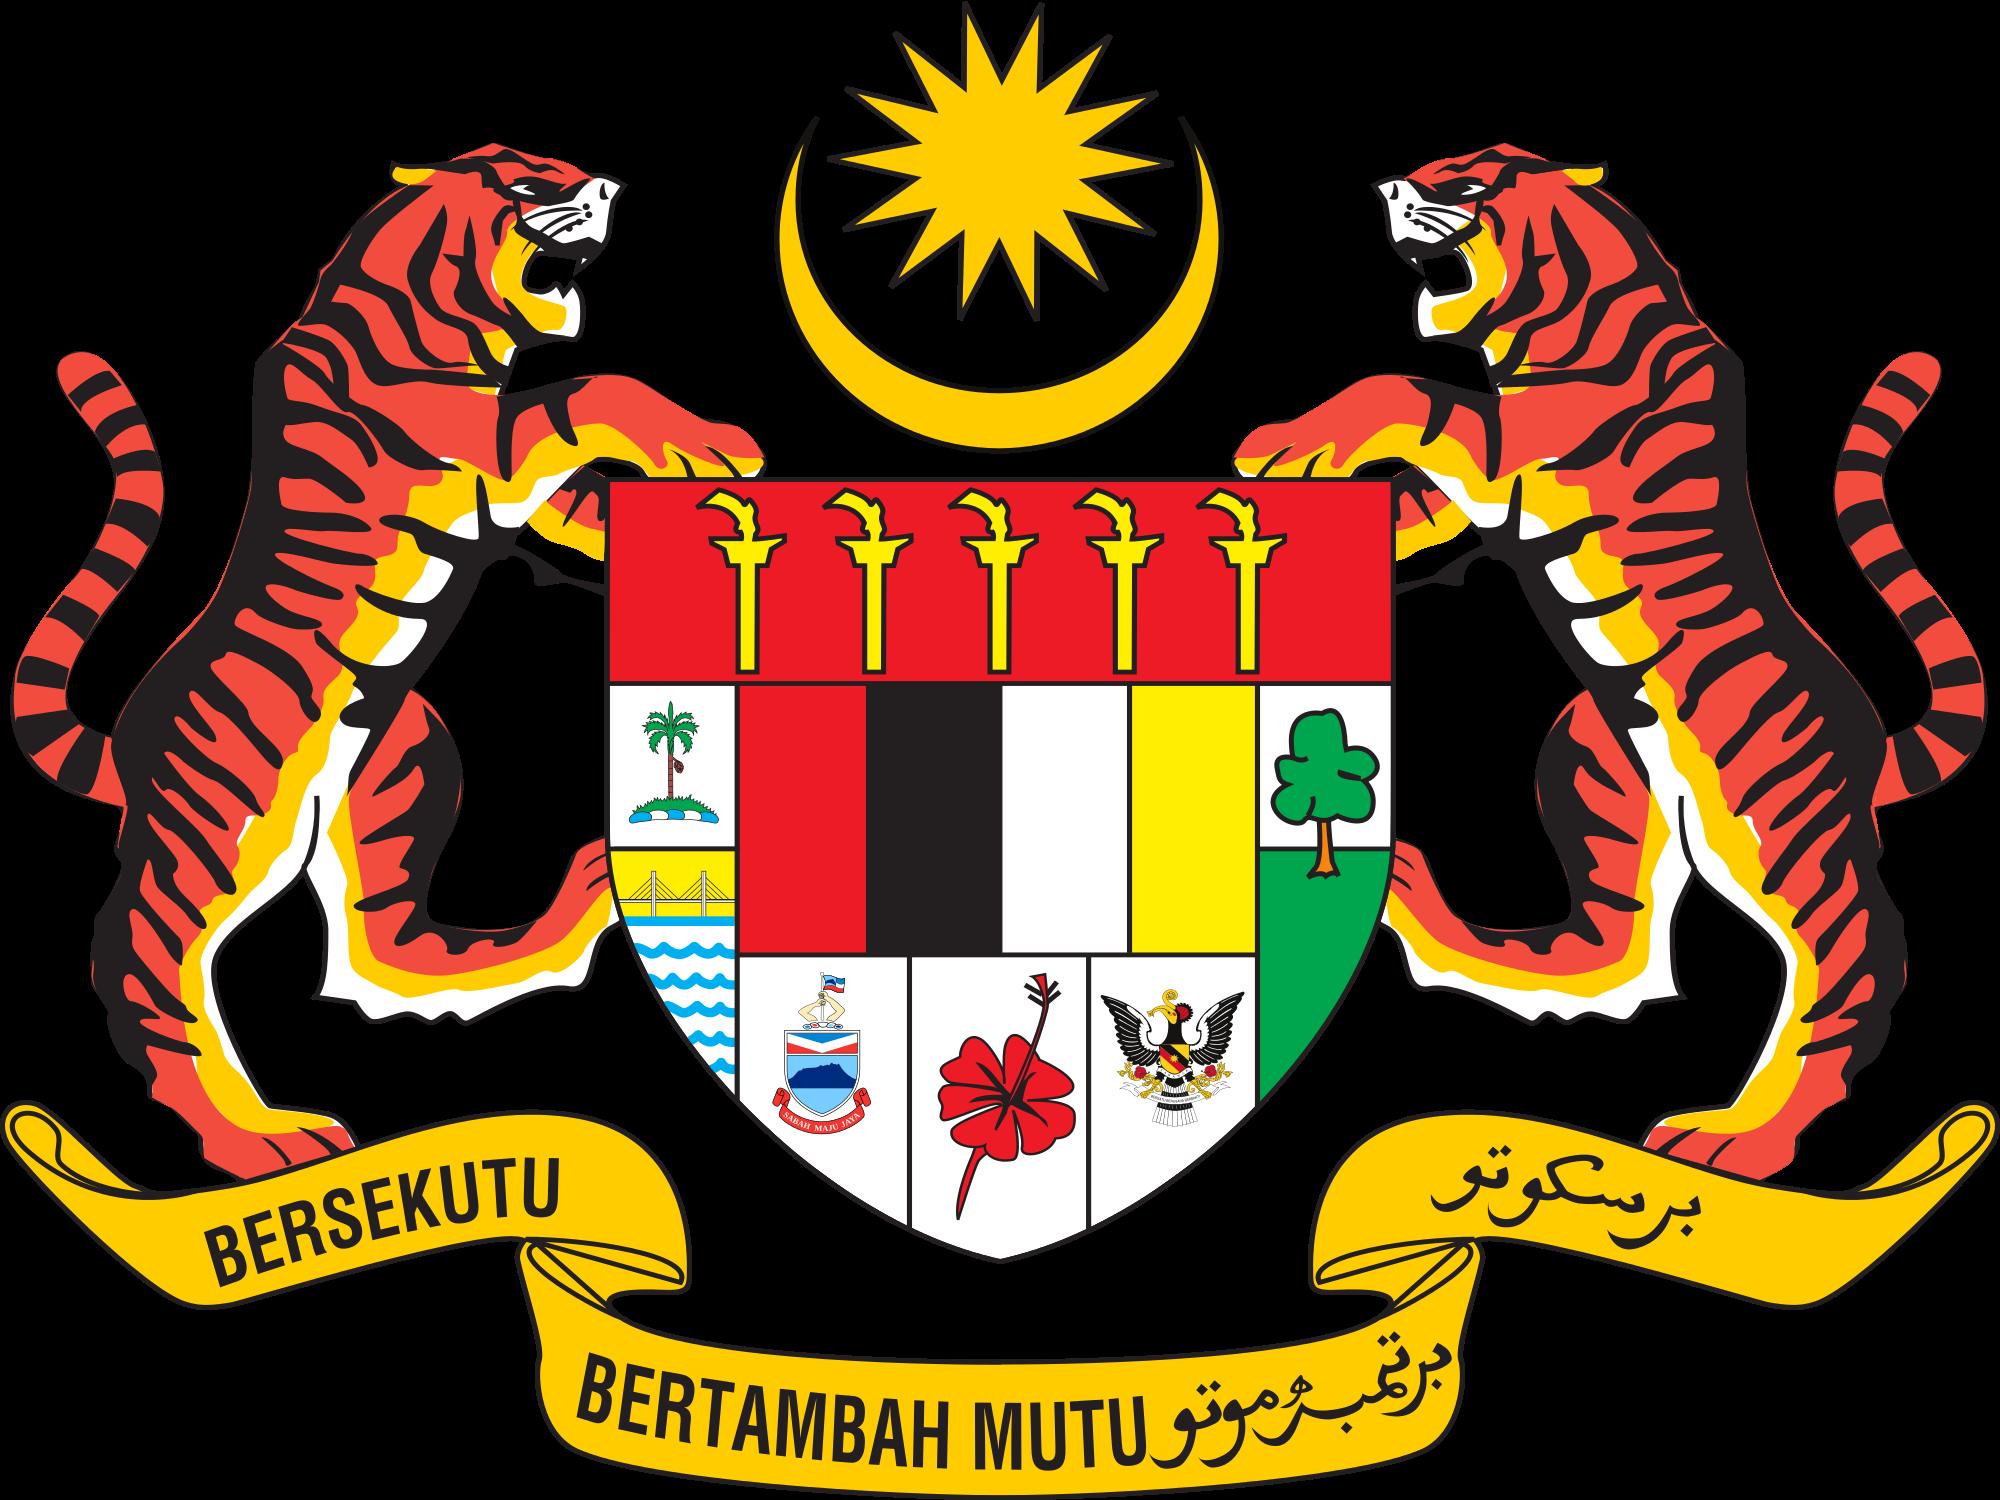 Malesian vaakuna